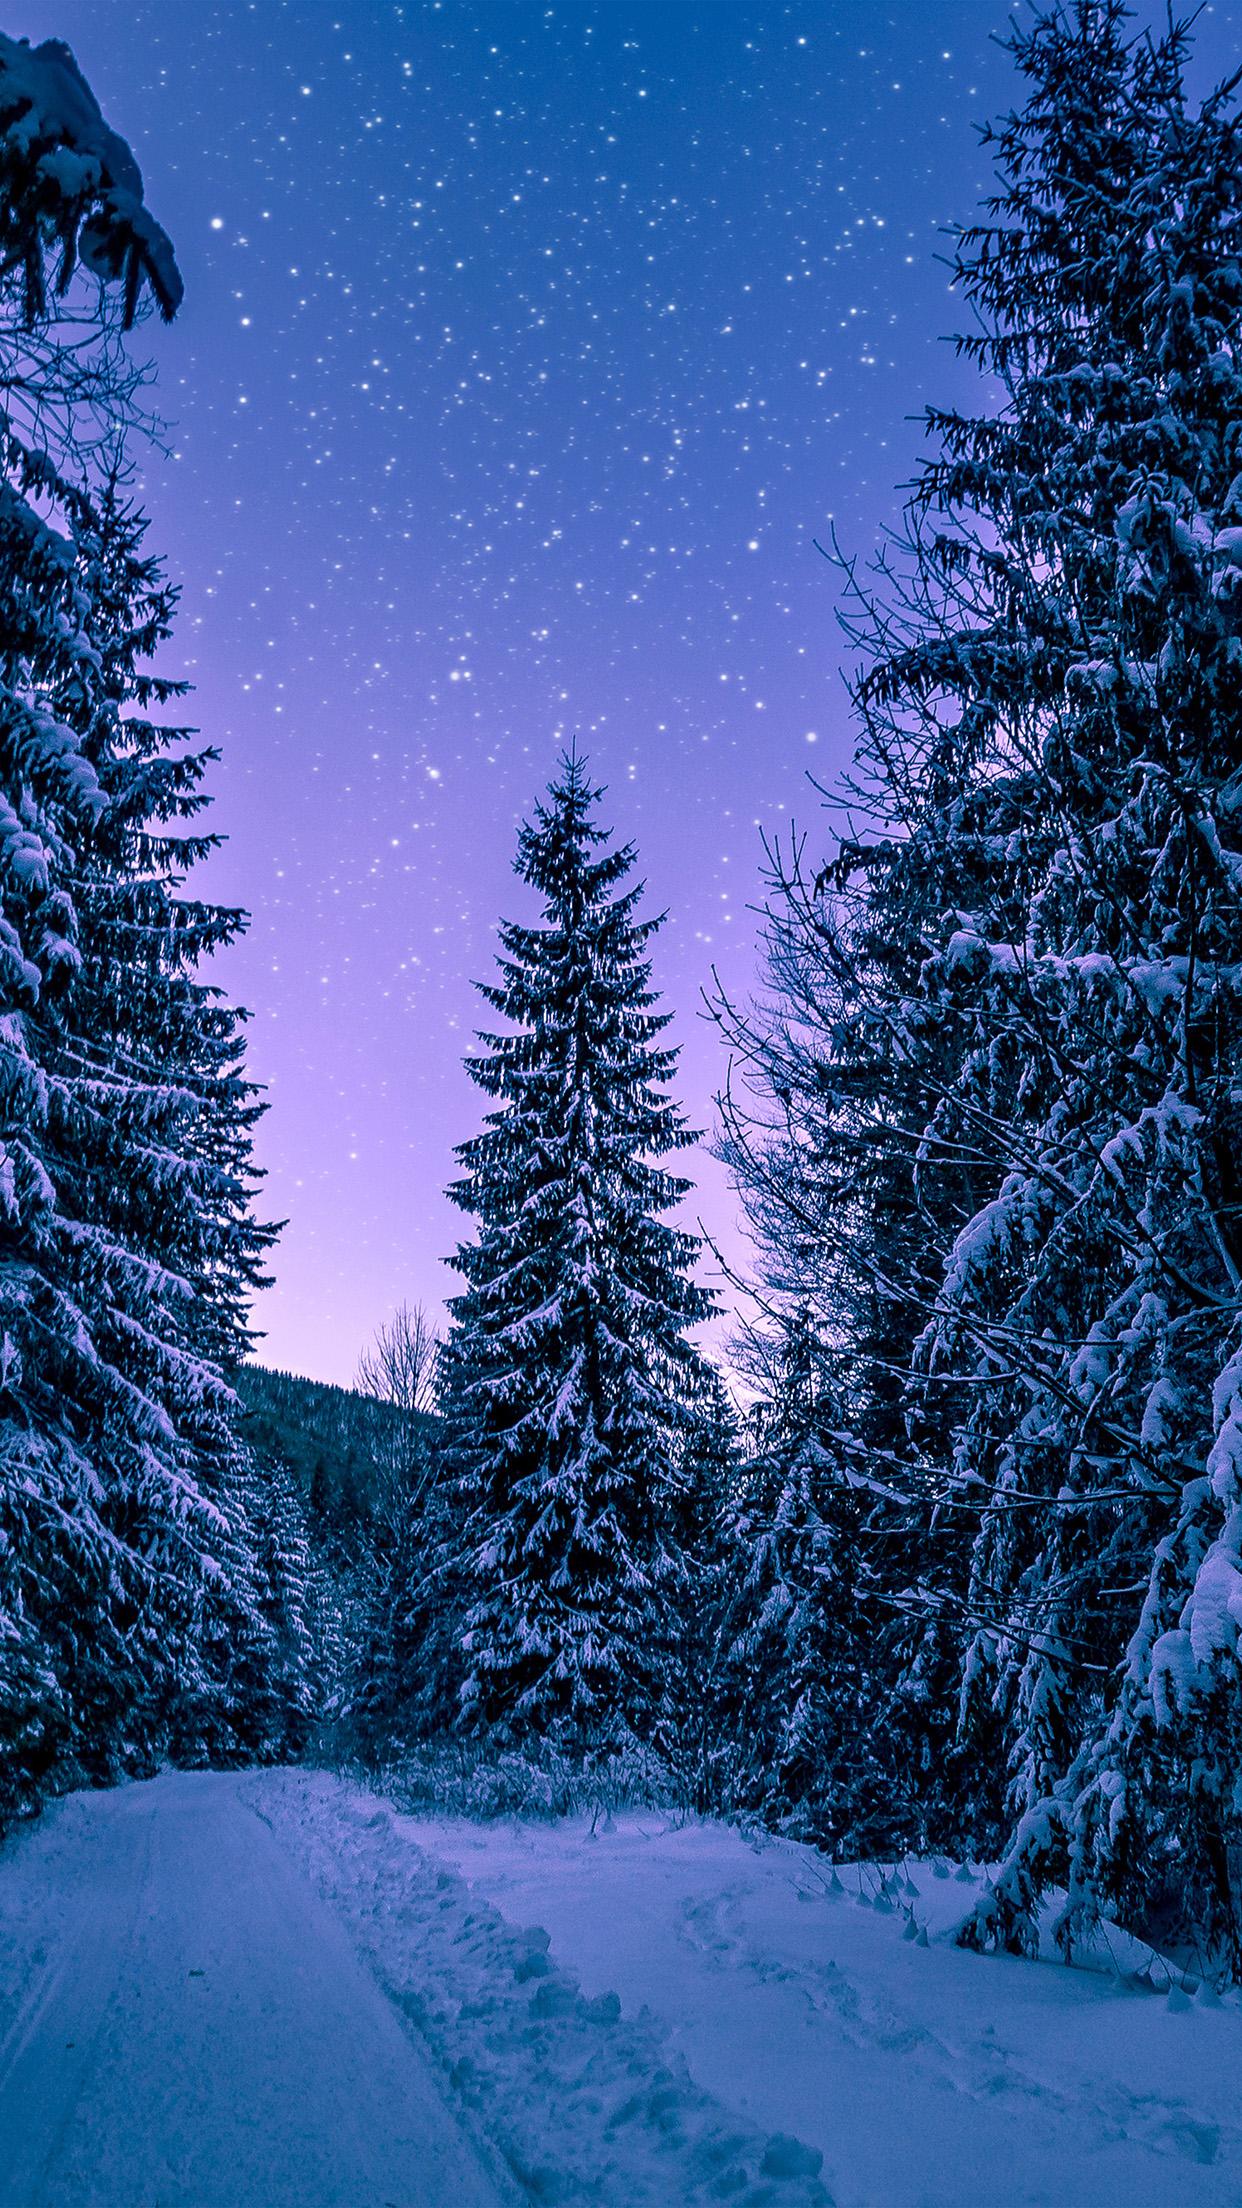 Fall Wallpaper Hd Iphone 5 Nx97 Snow Winter Wood Tree Road Night Nature Wallpaper